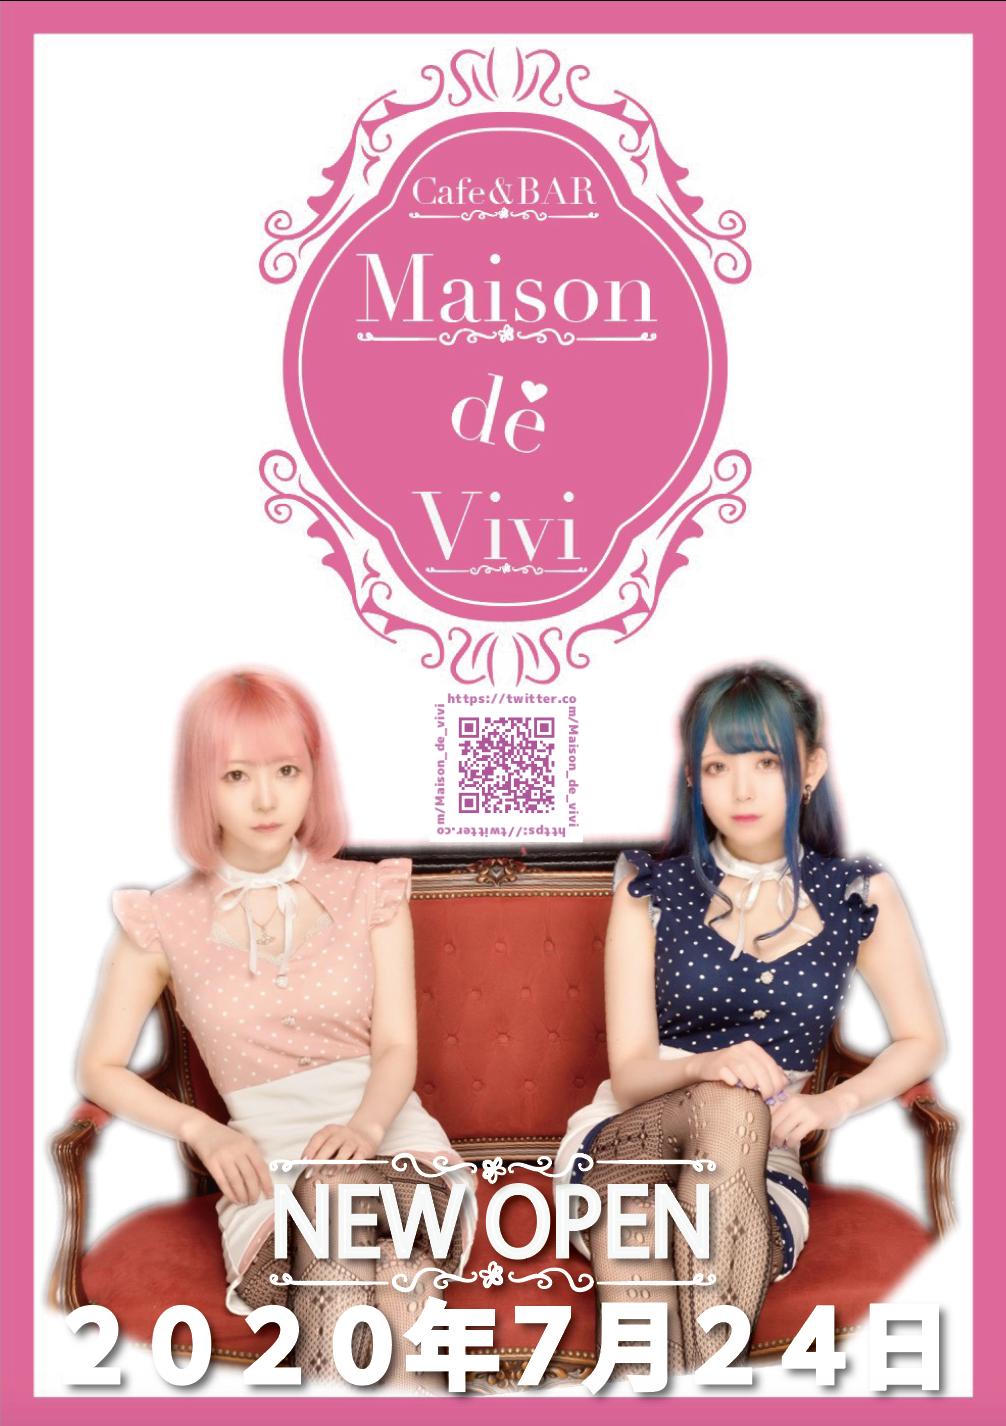 Maison de Vivi(メゾンドビビ)の写真